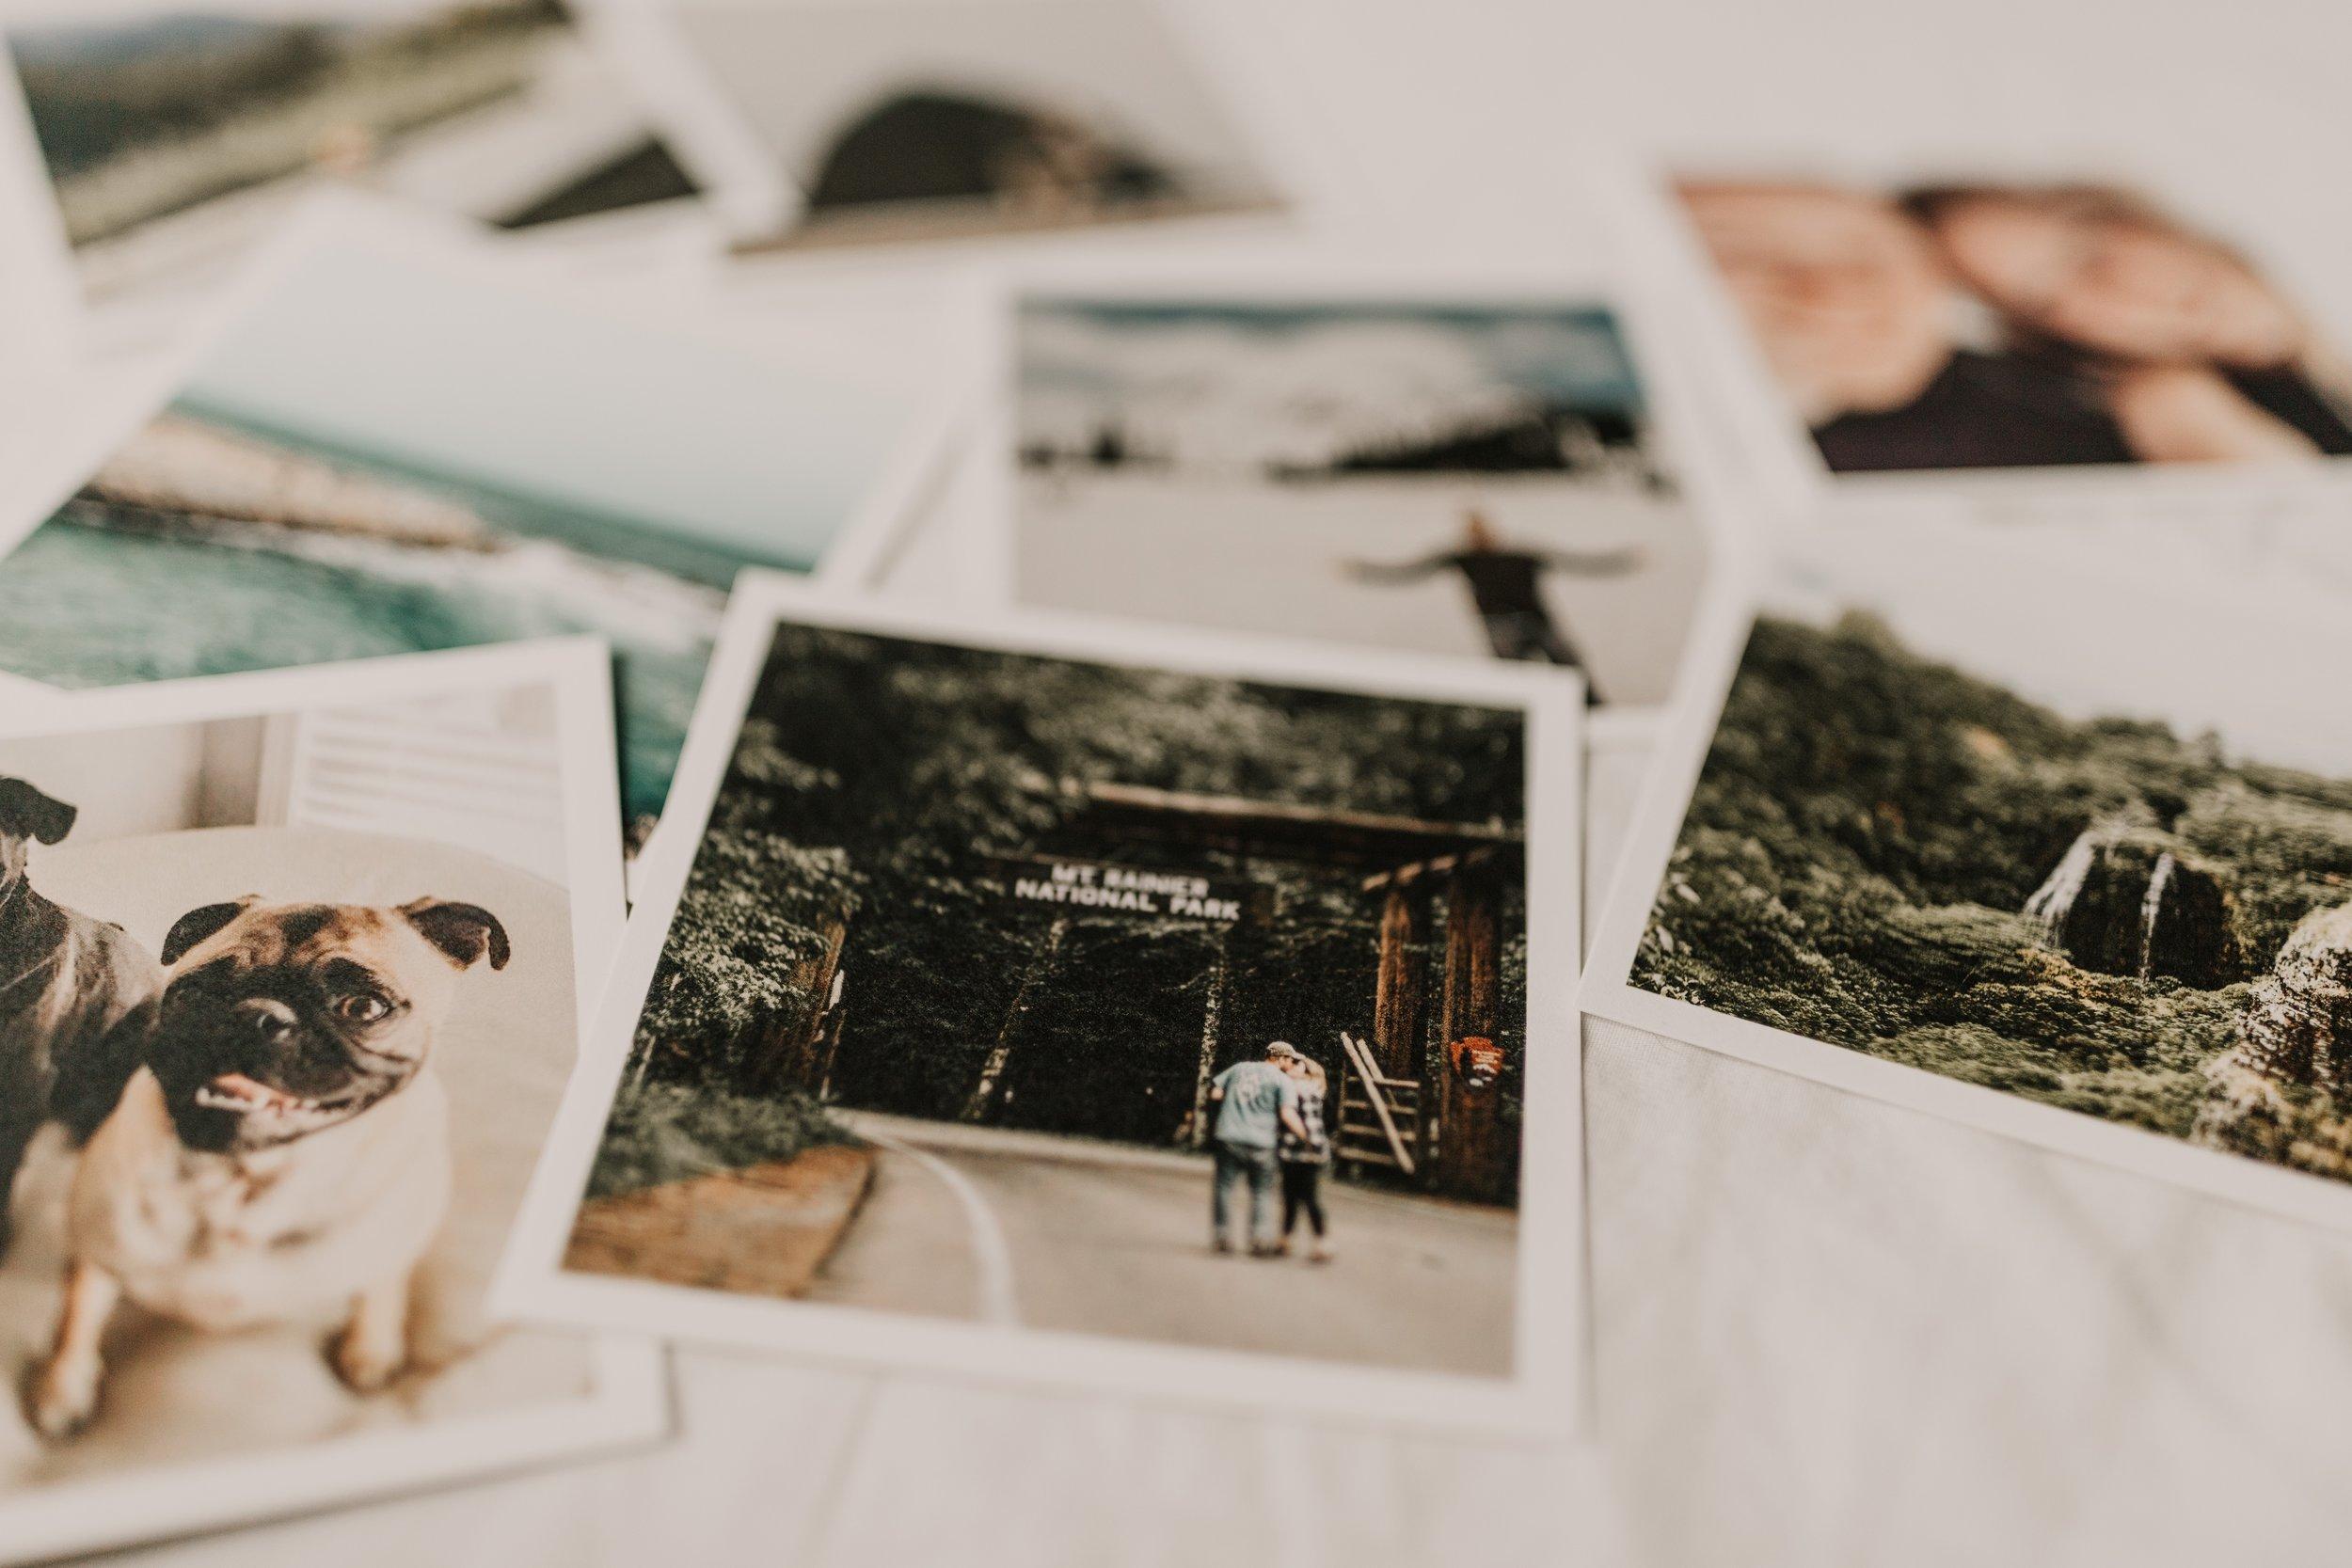 How traveling can heal your broken heart